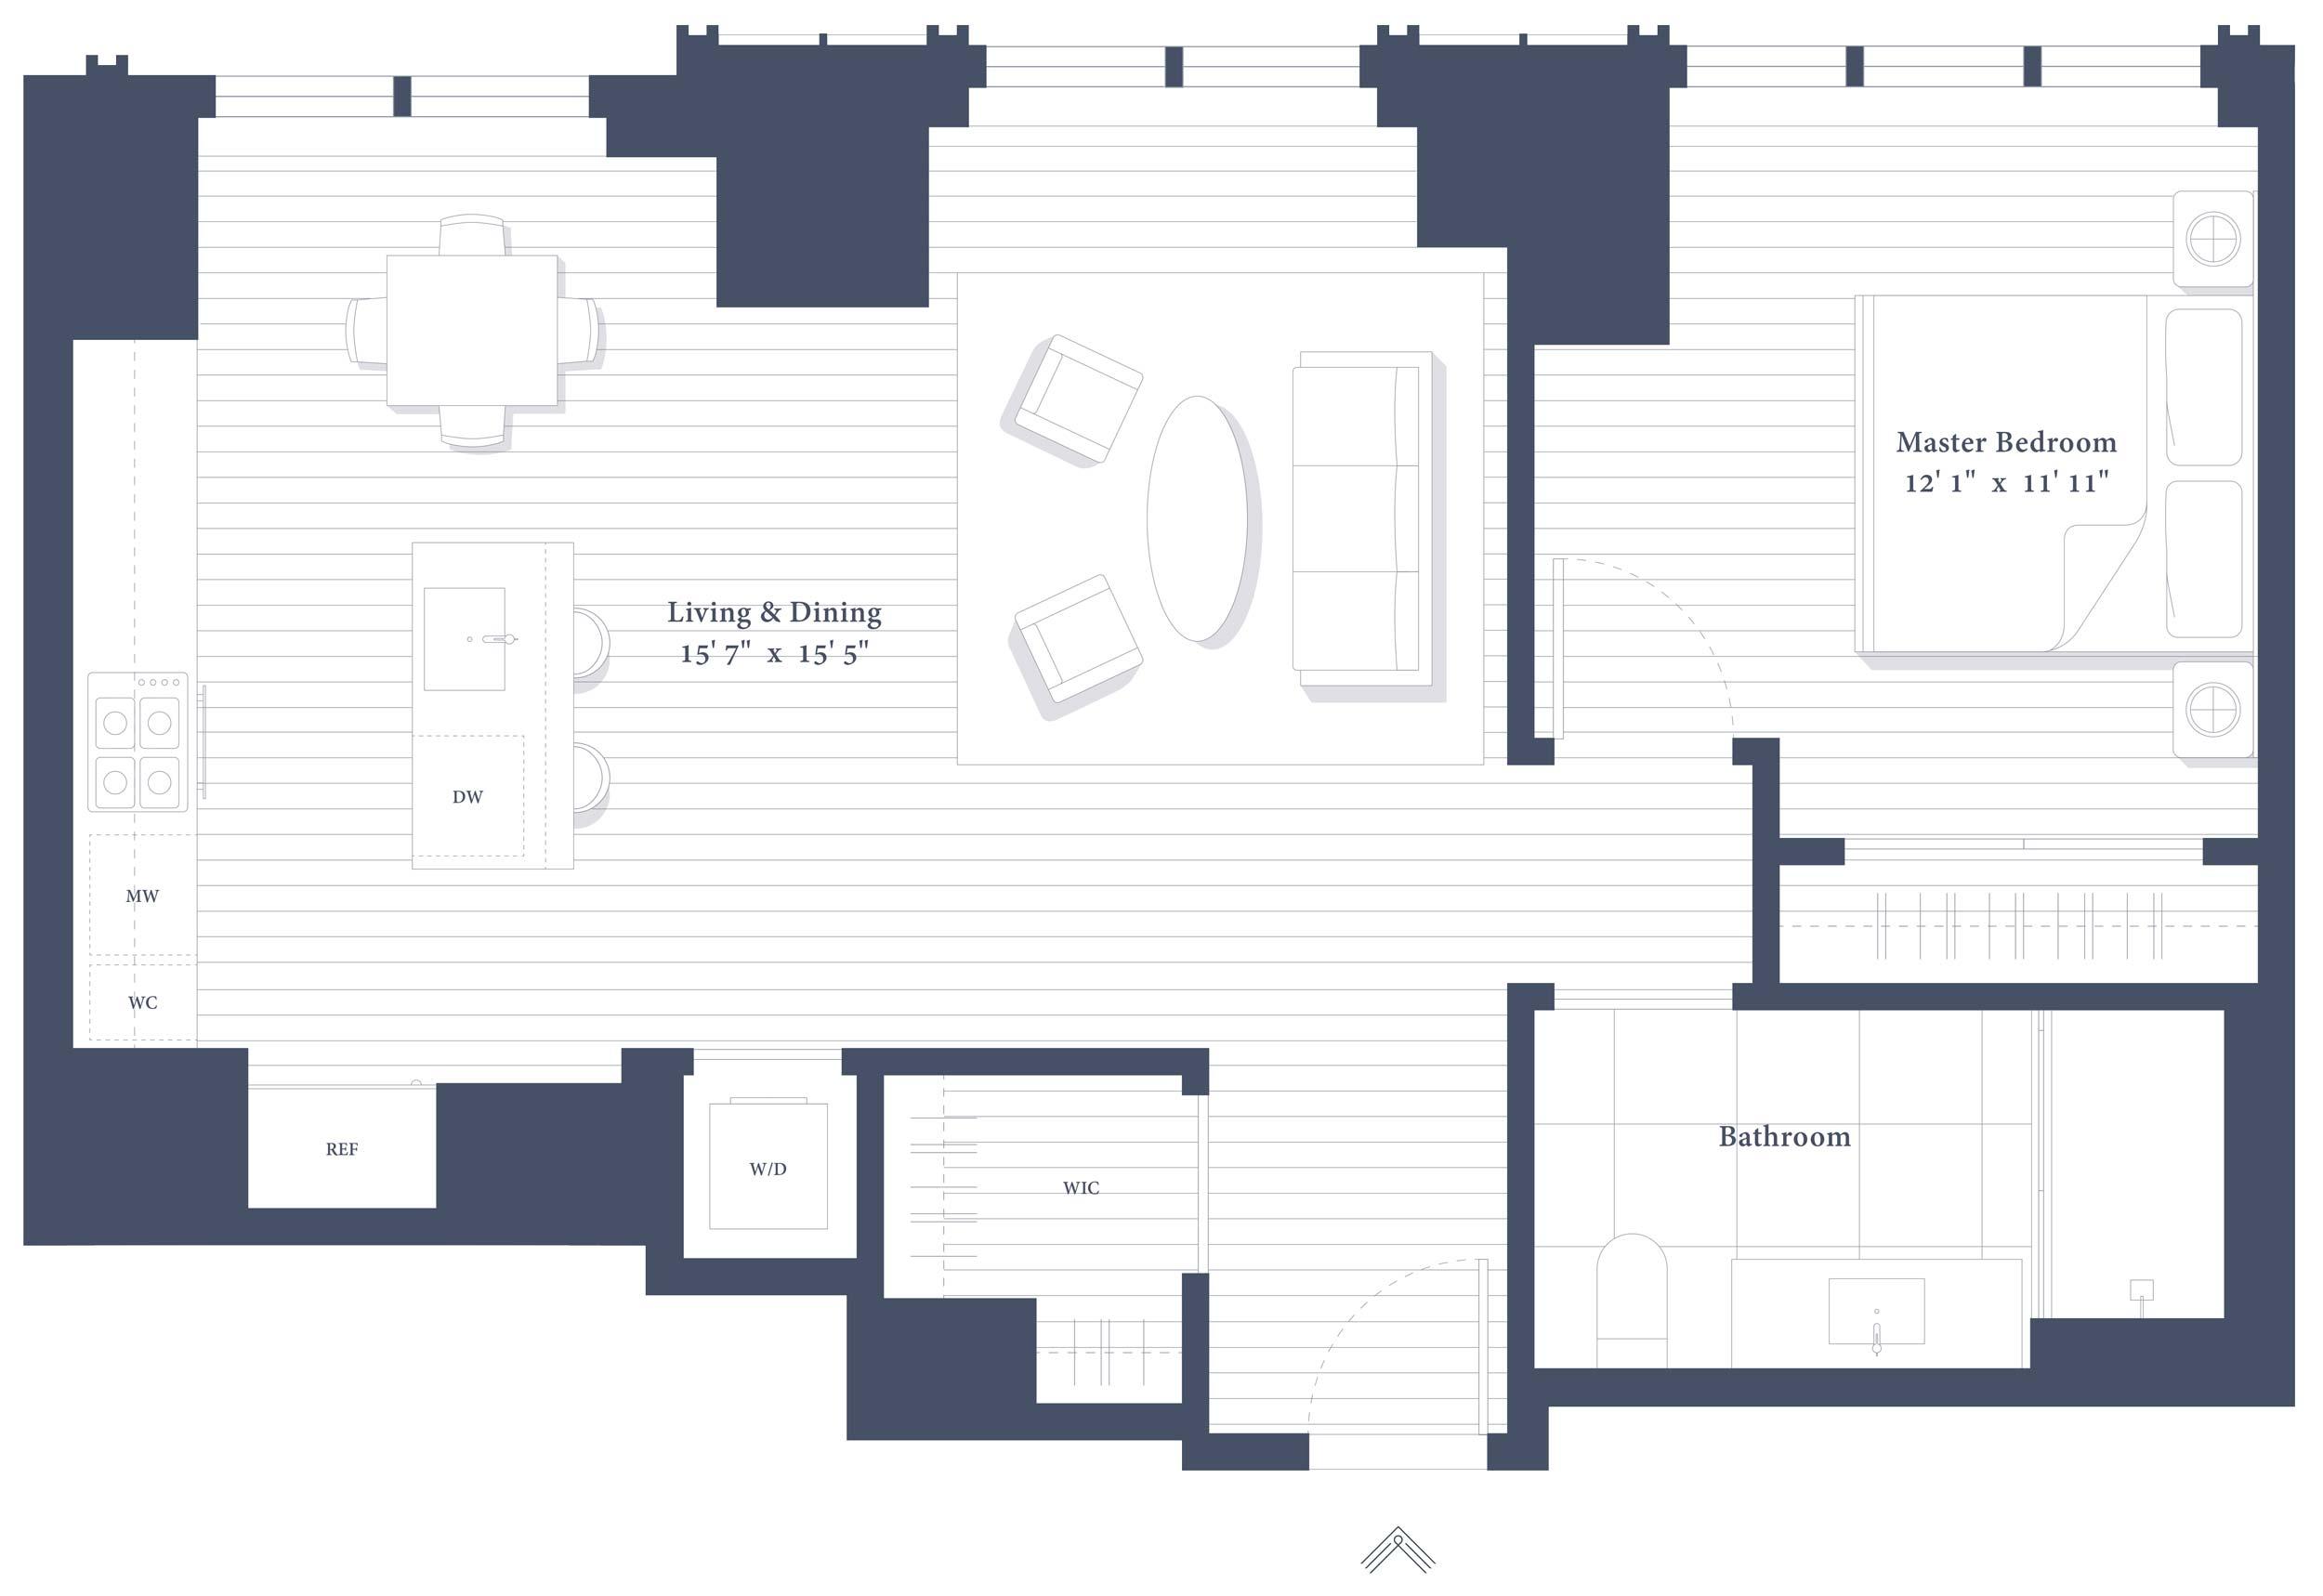 26B Floor Plan